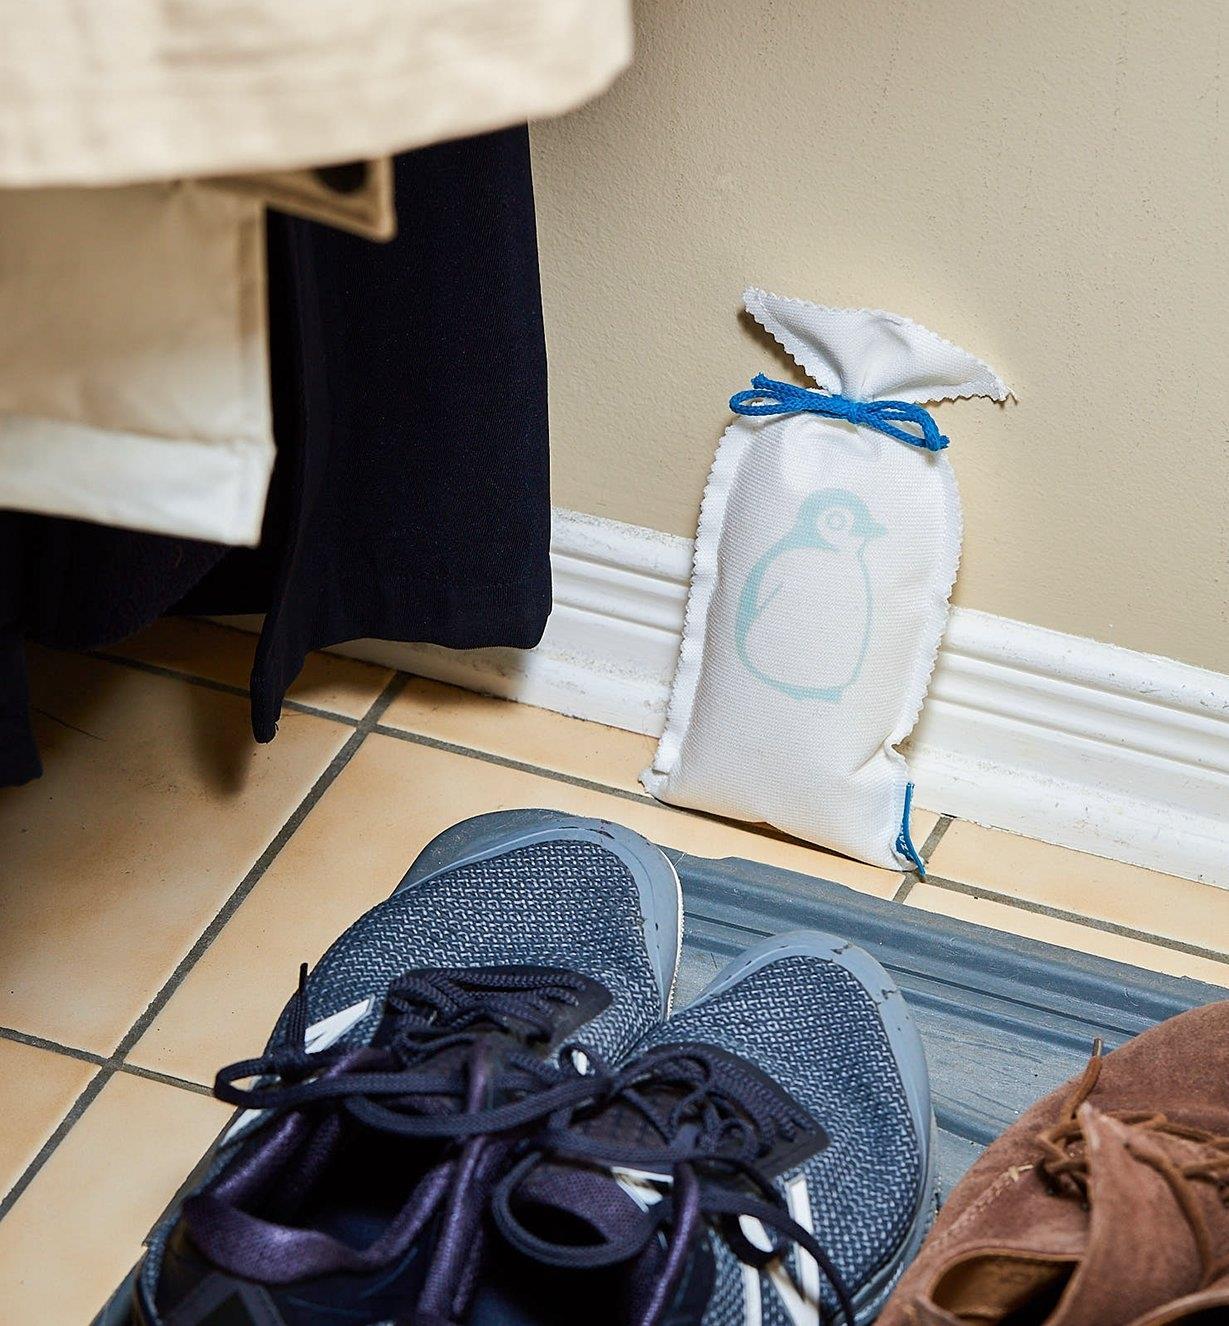 Dehumidifier bag placed near a shoe mat